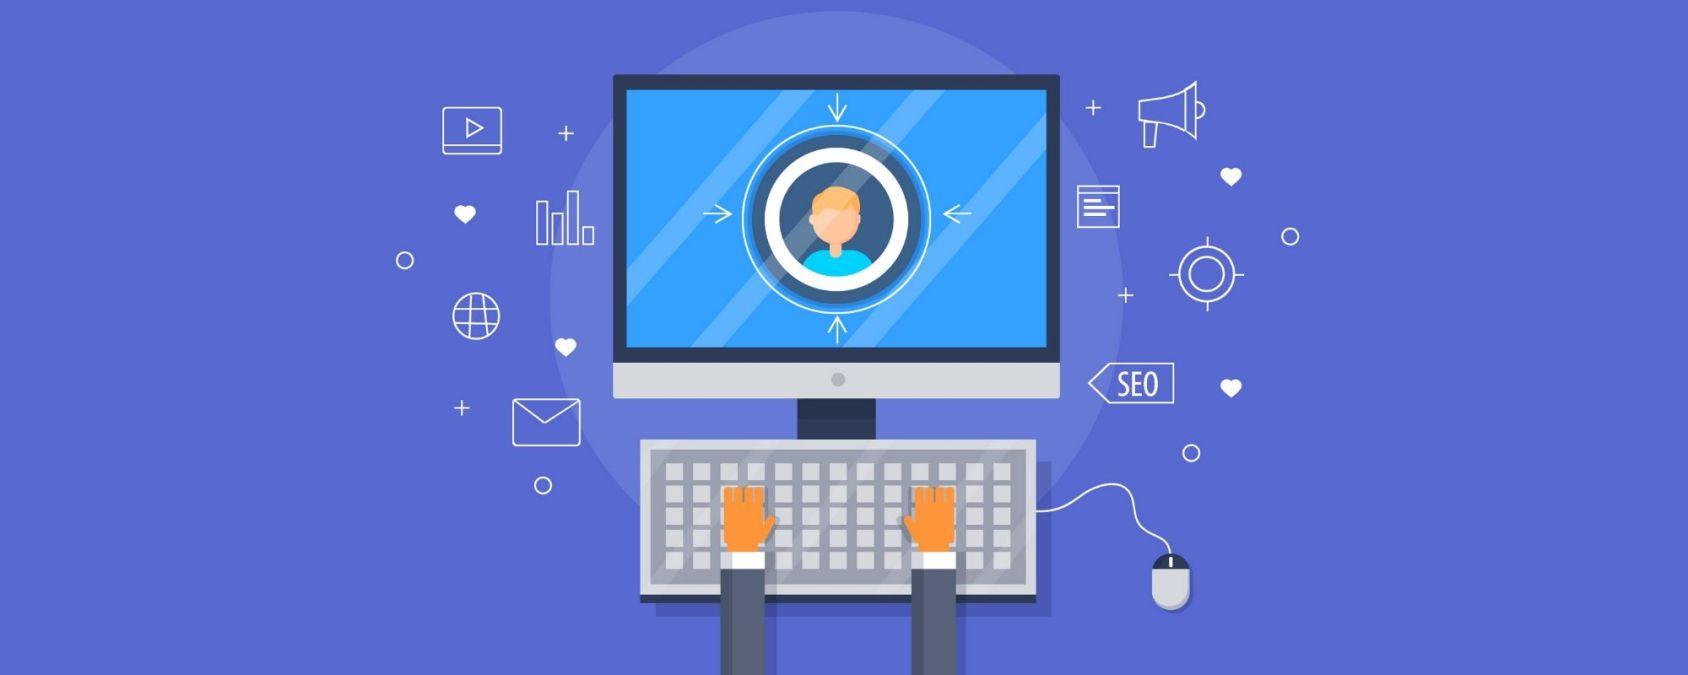 5 types of social media targeting